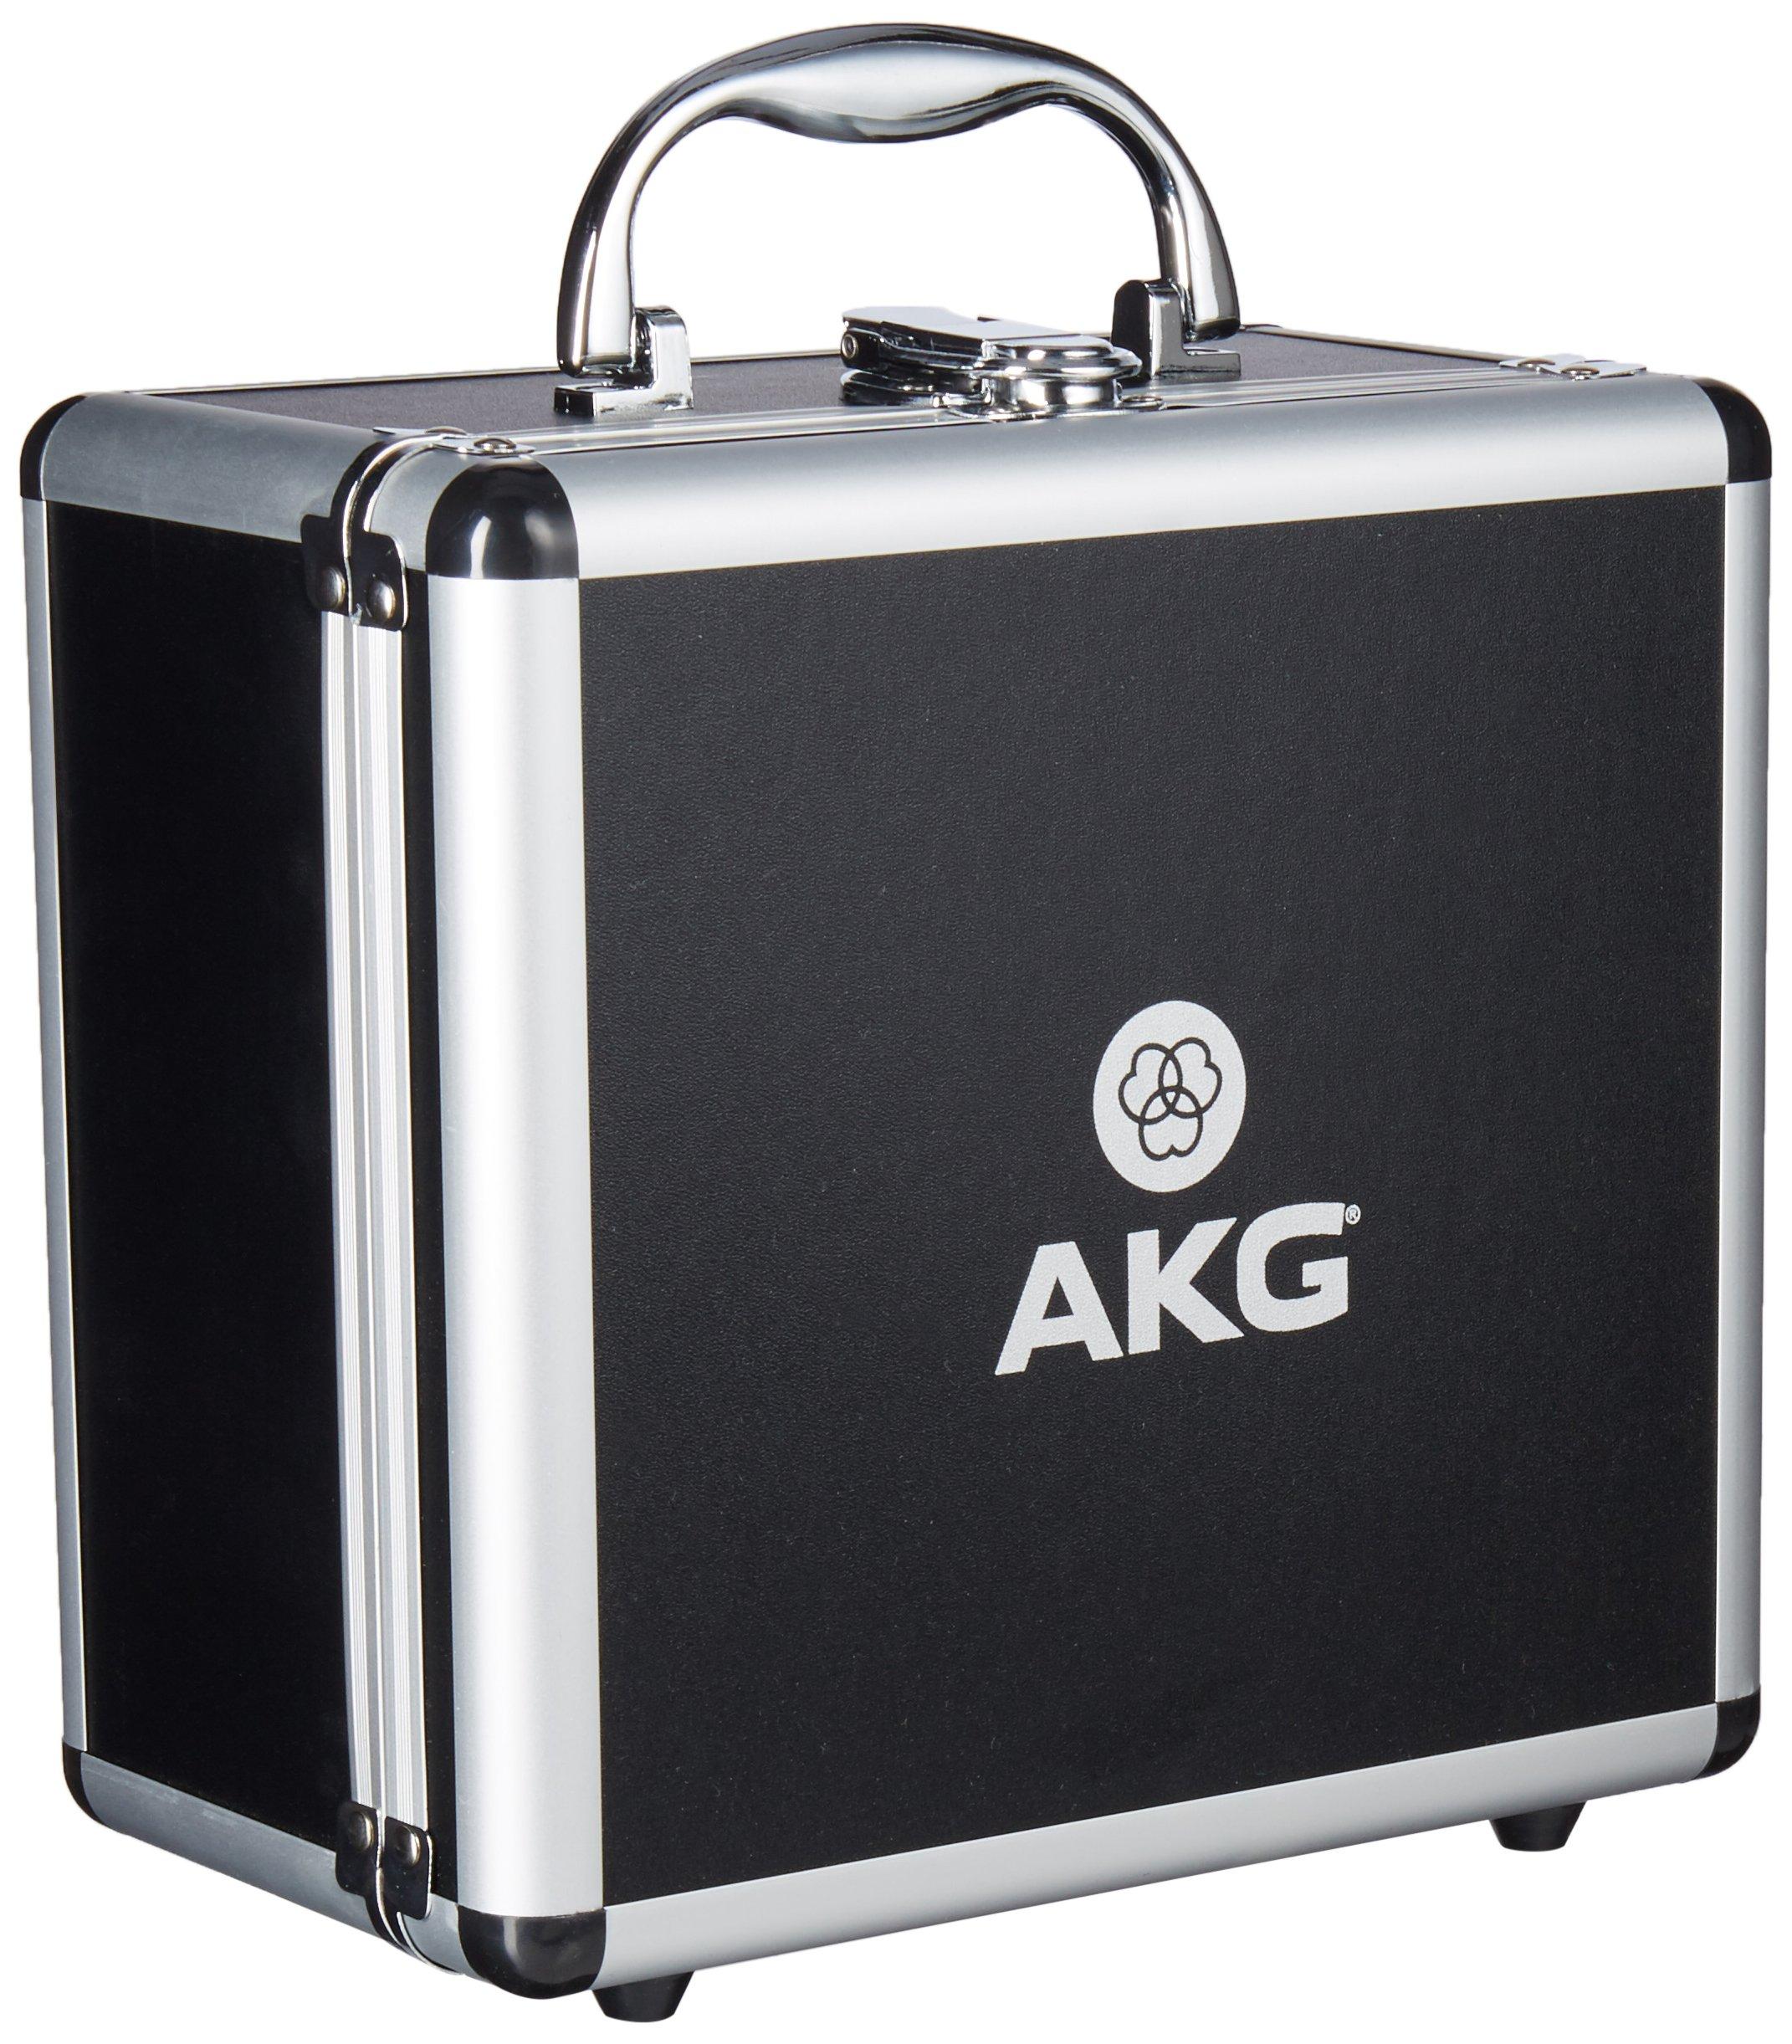 AKG Perception 220 Professional Studio Microphone by AKG Pro Audio (Image #3)